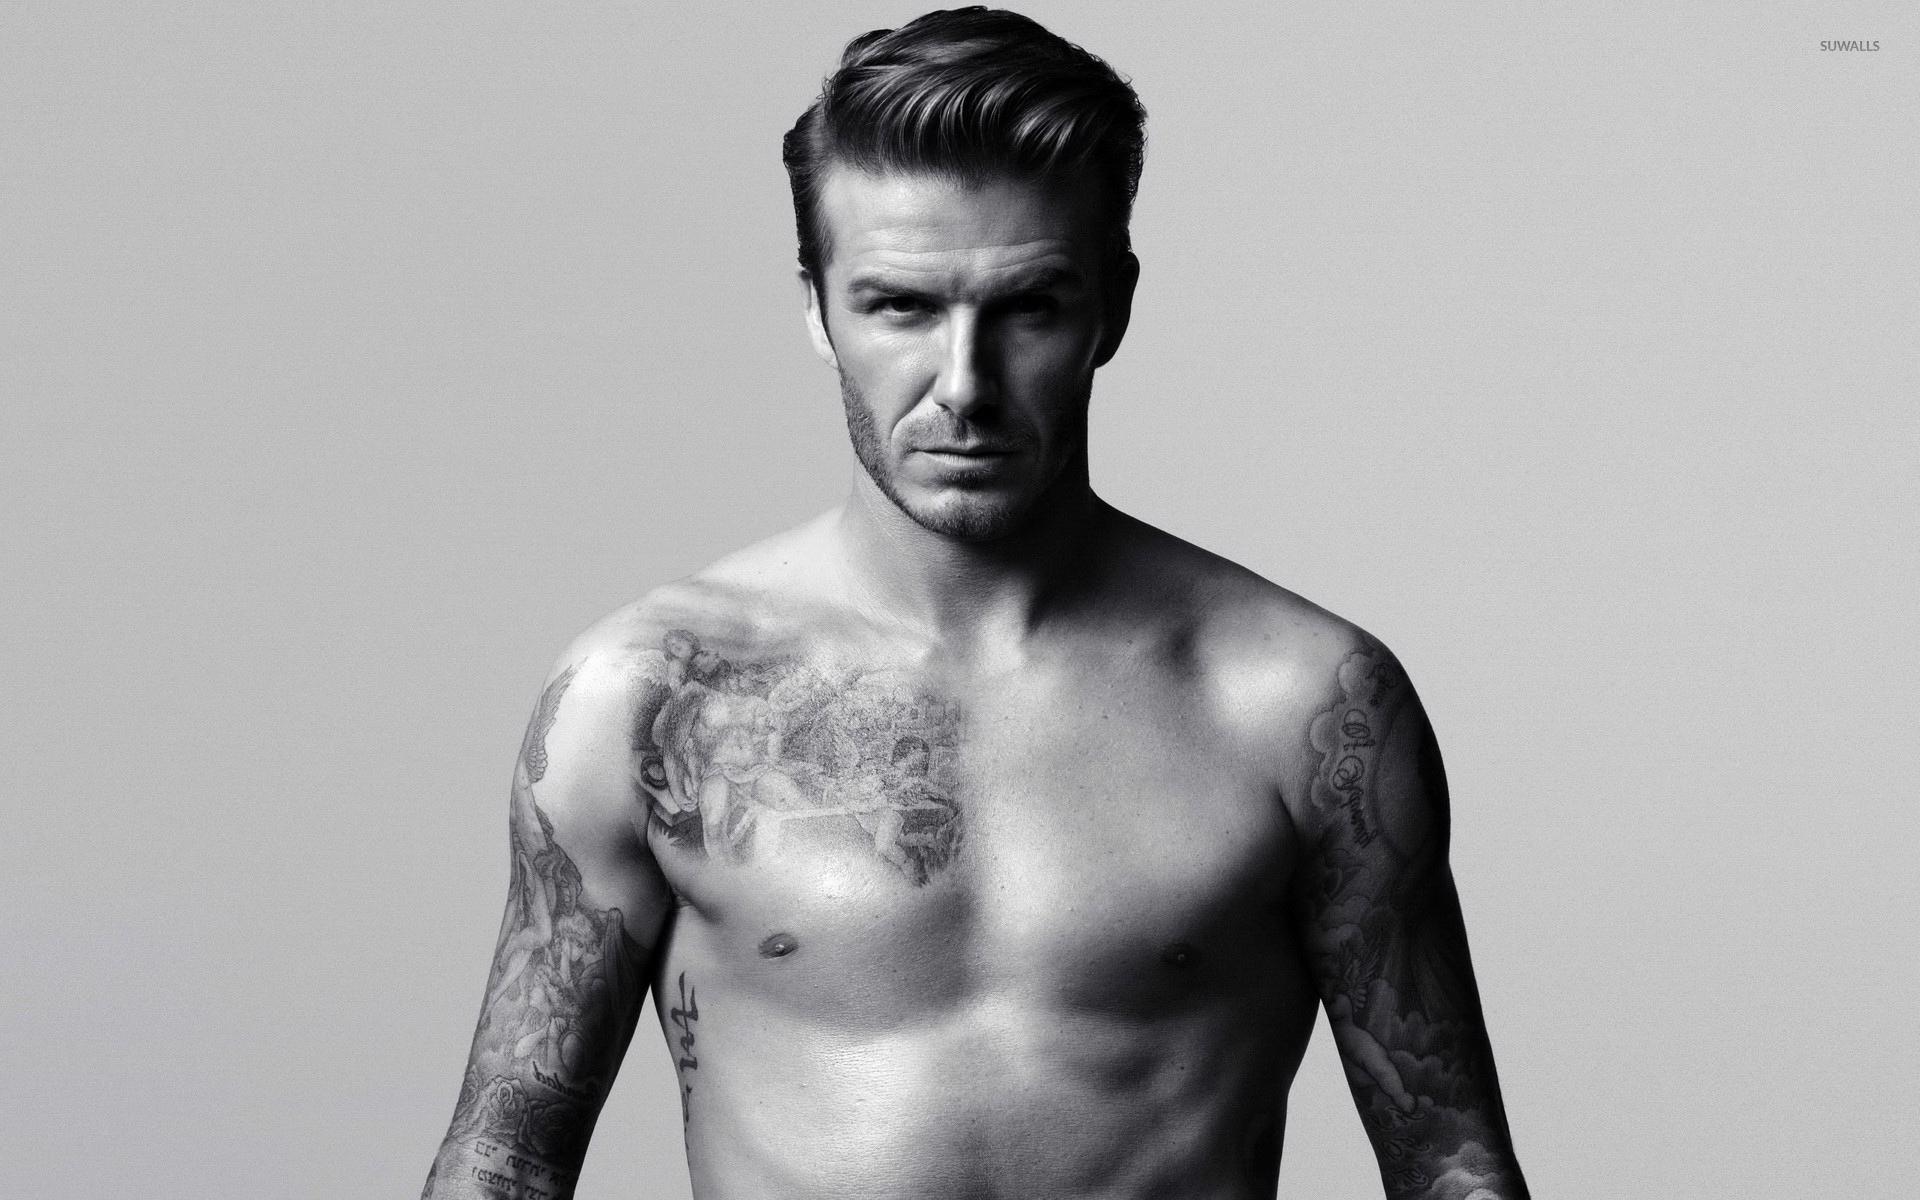 David Beckham Showing His Tattoos Wallpaper Male Celebrity